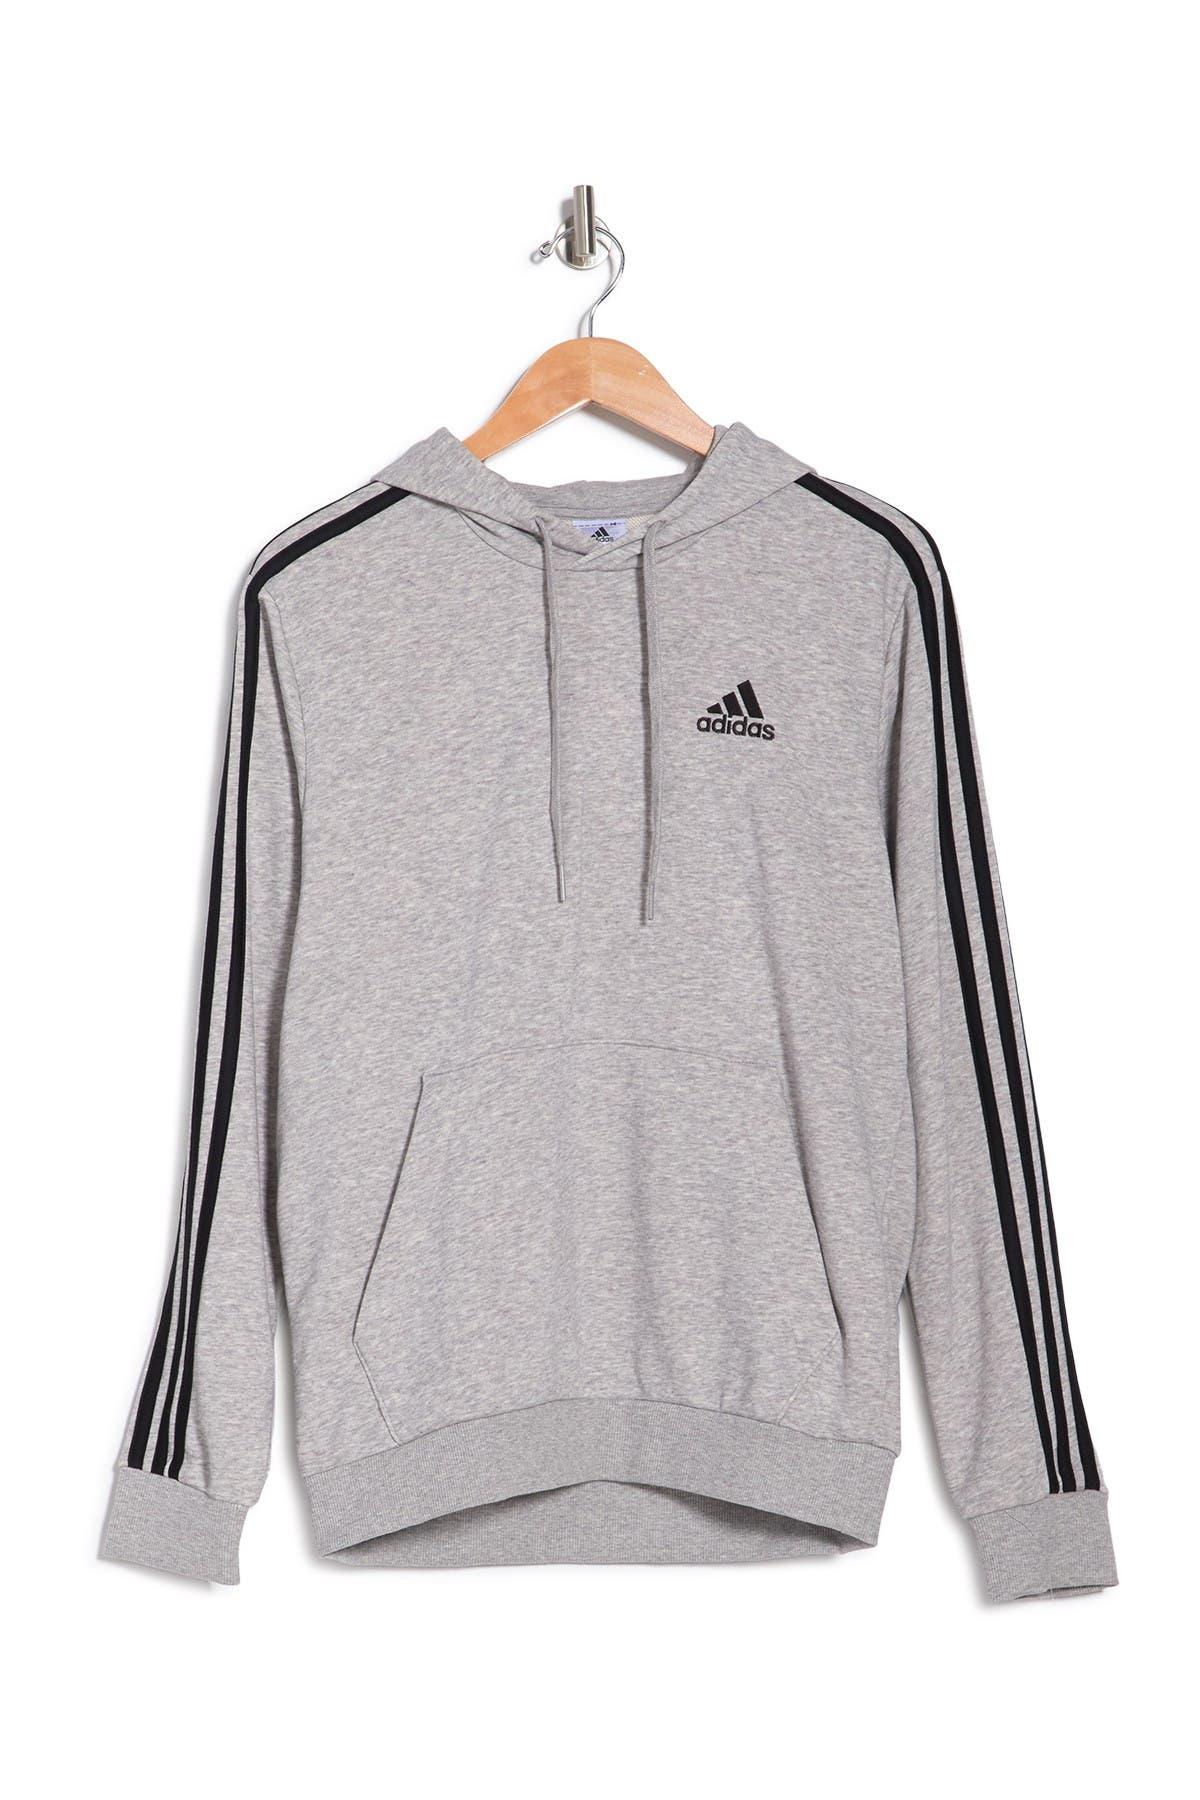 Adidas Originals Cottons ESSENTIALS 3 STRIPES HOODIE